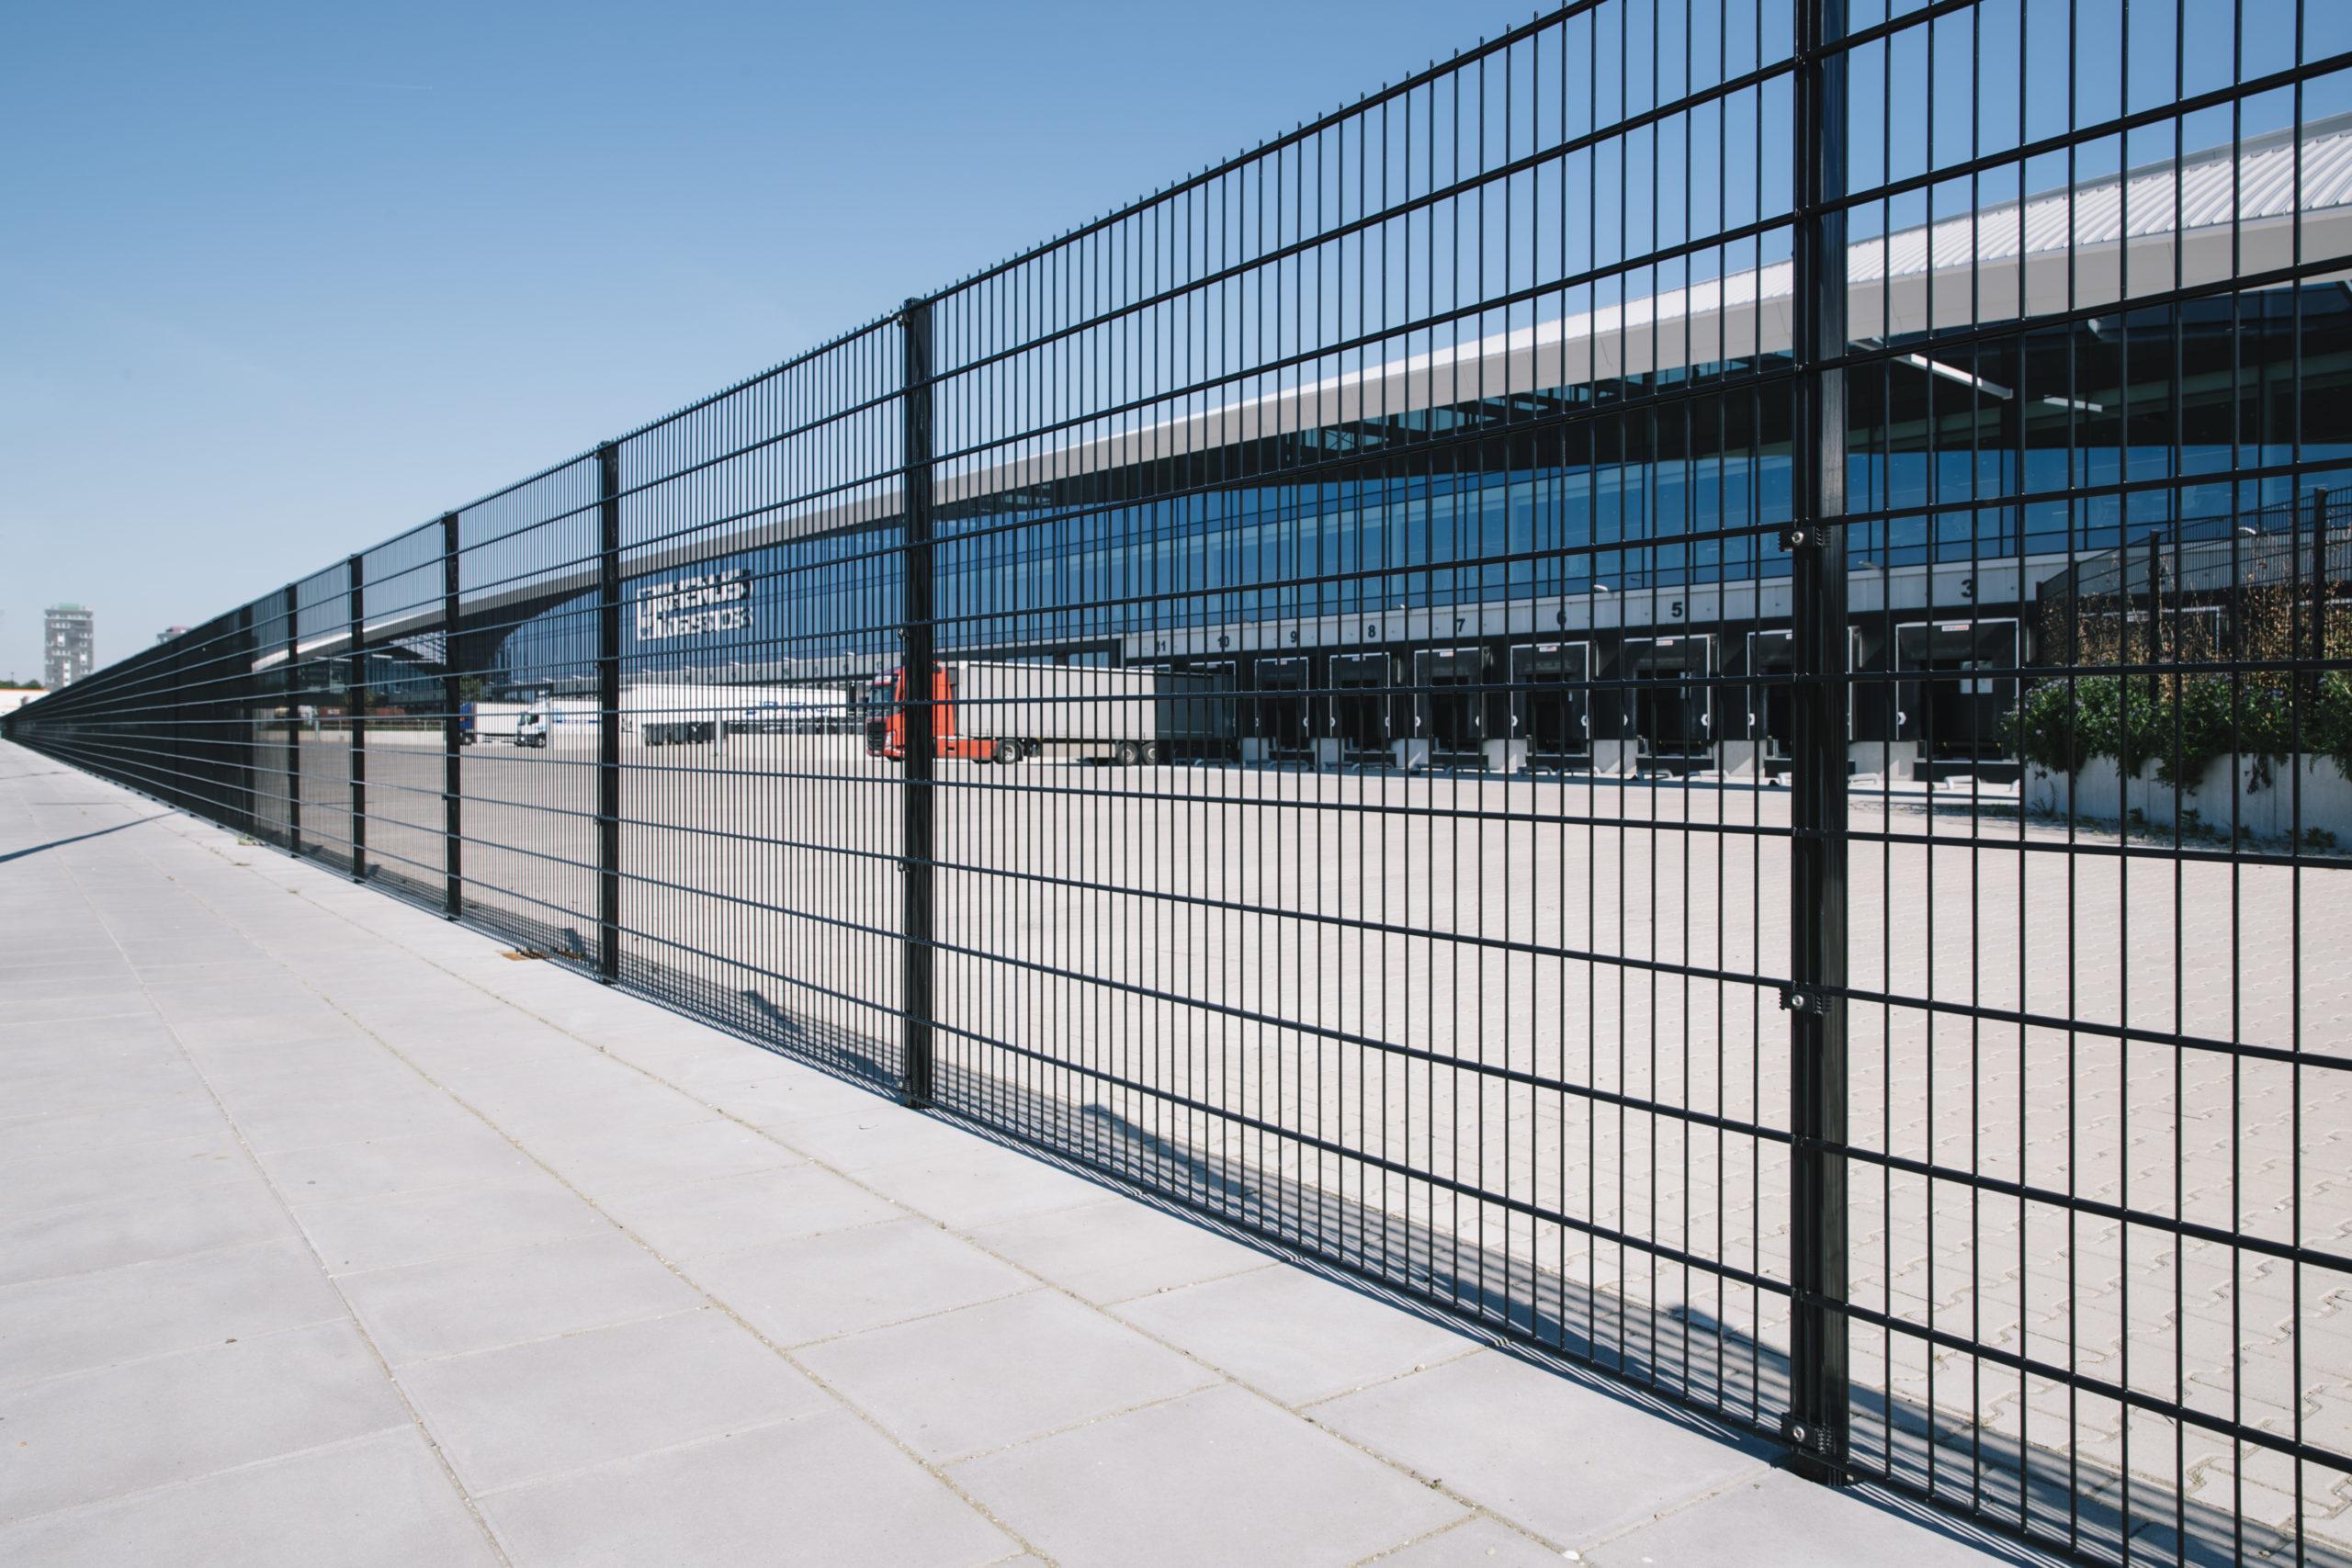 Staalmathekwerk Uni Security